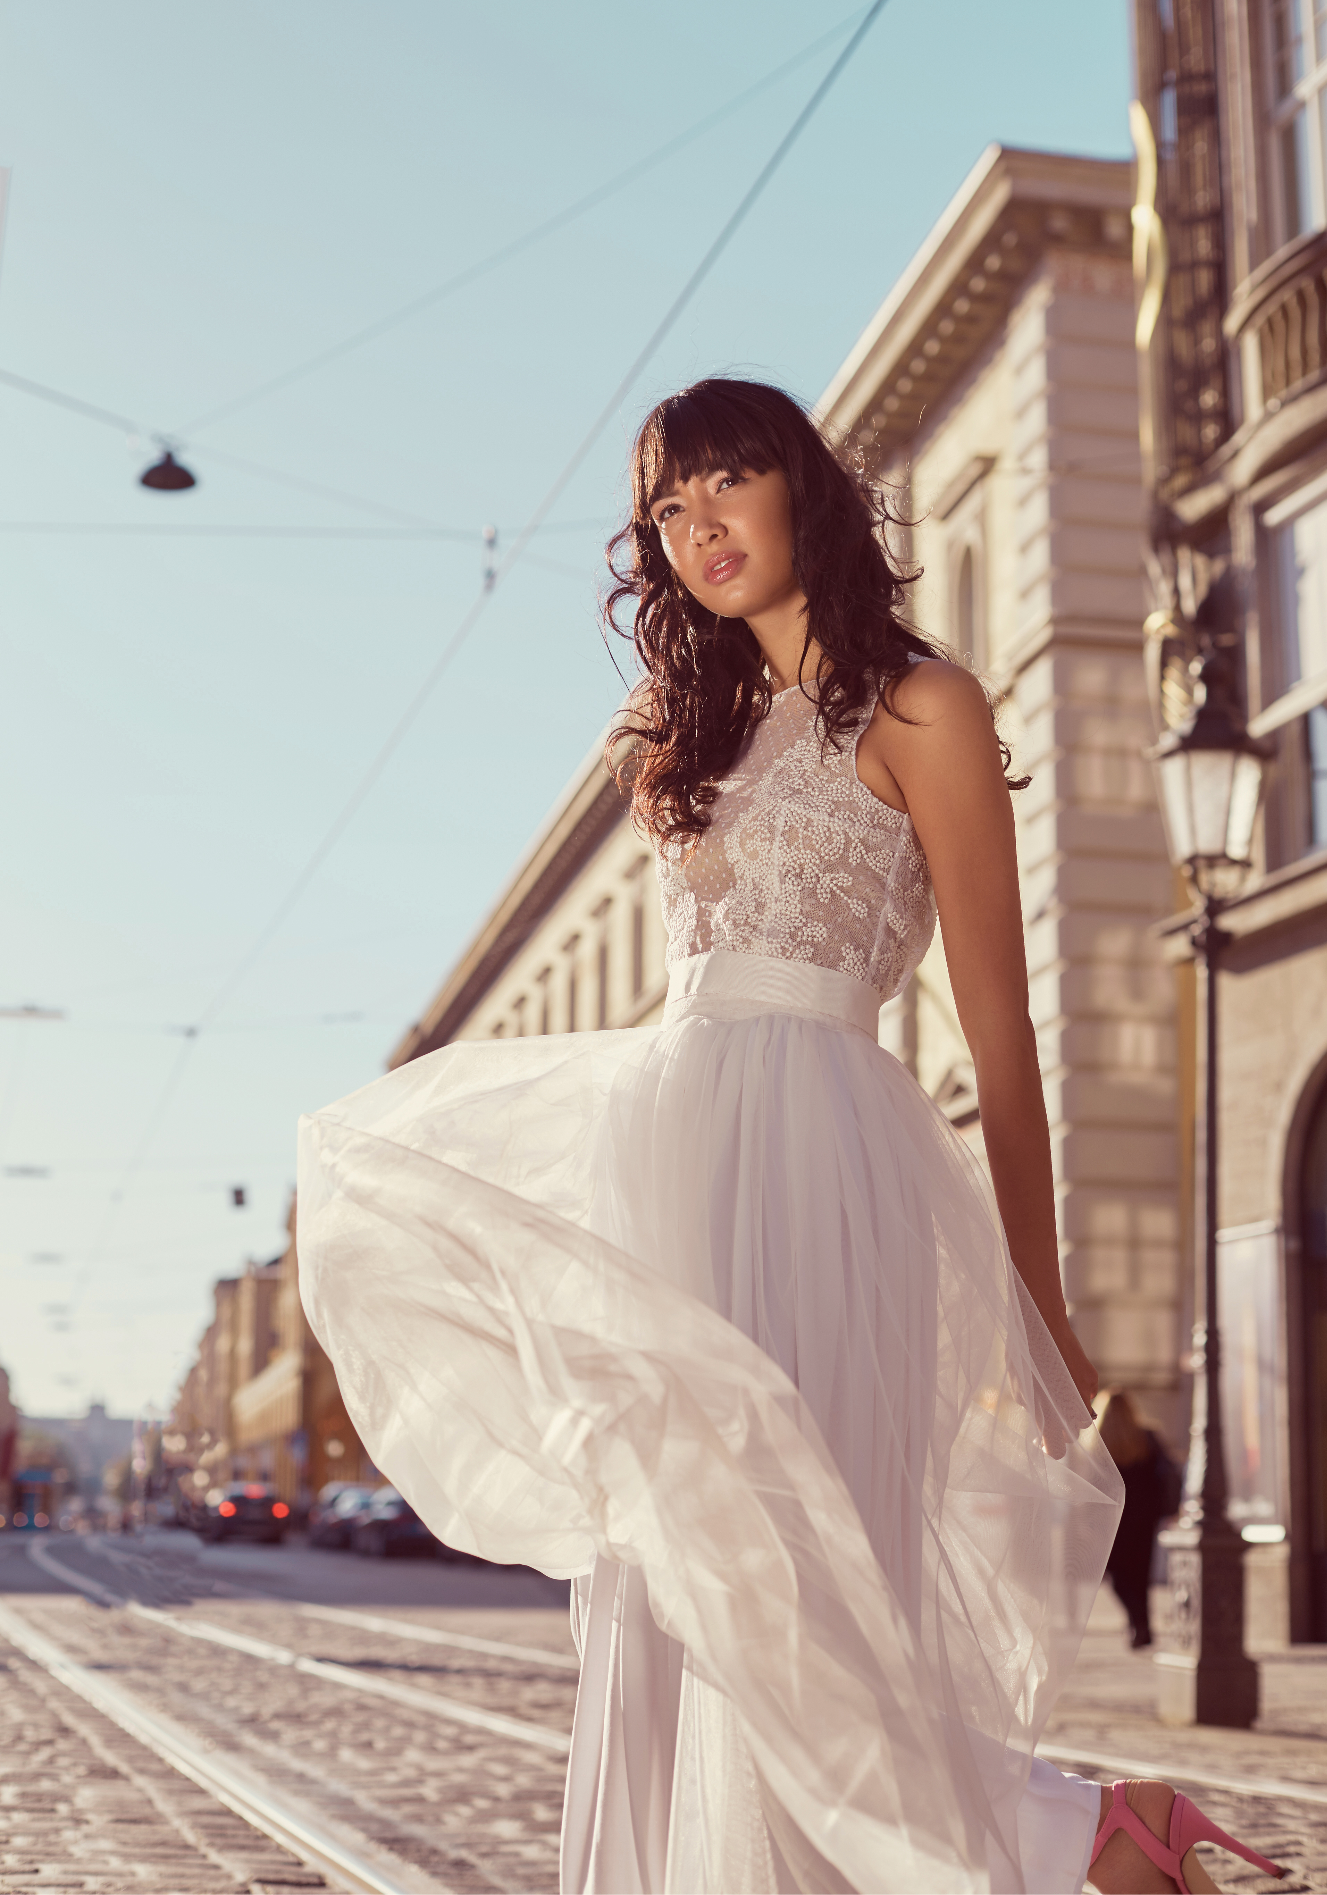 juliful_bridal_couture_Foto_www